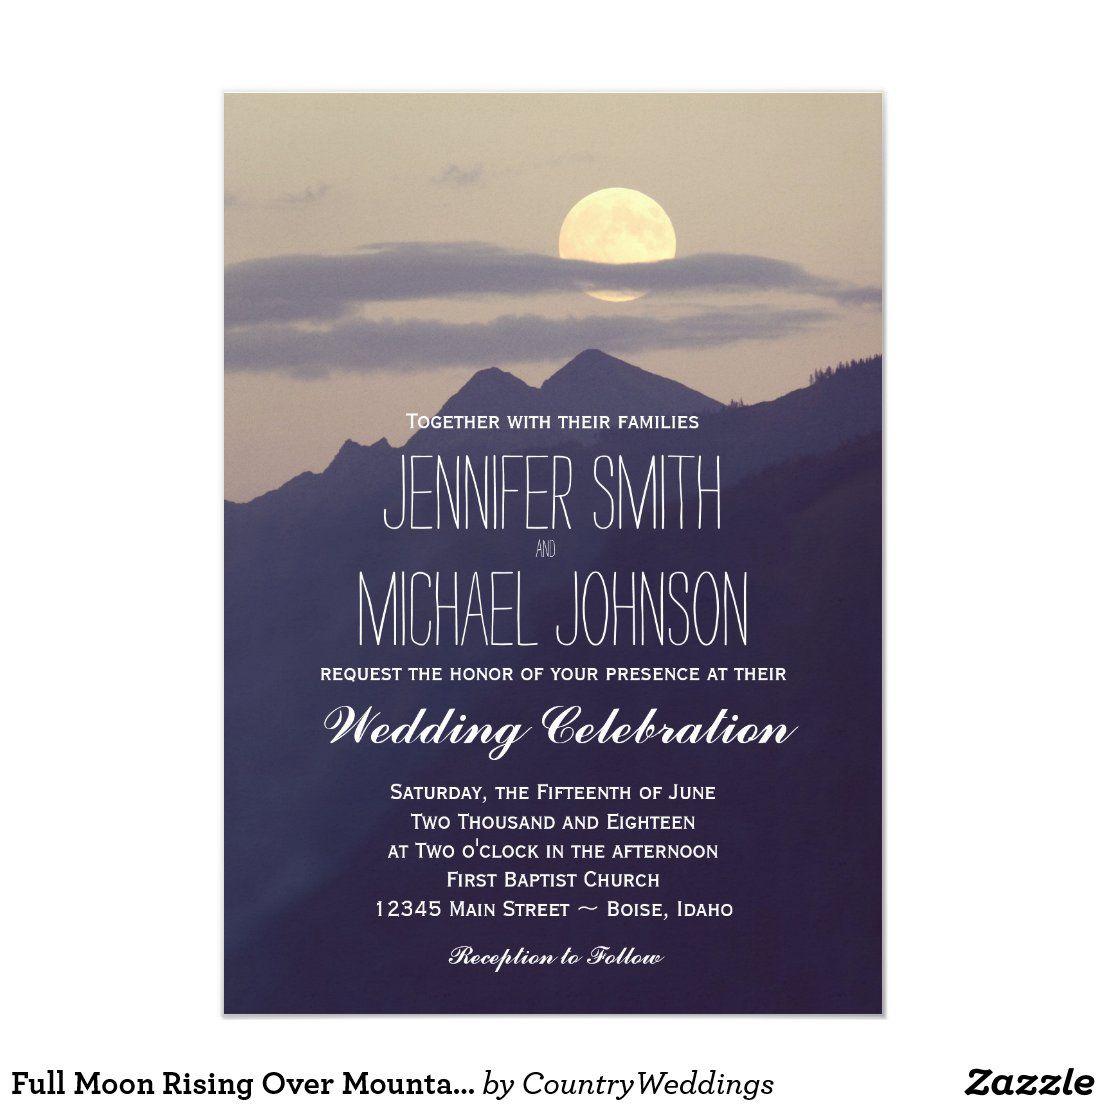 Full Moon Rising Over Mountains Wedding Invites Zazzle Com Mountain Wedding Invitations Nature Wedding Invitations Wedding Invitations